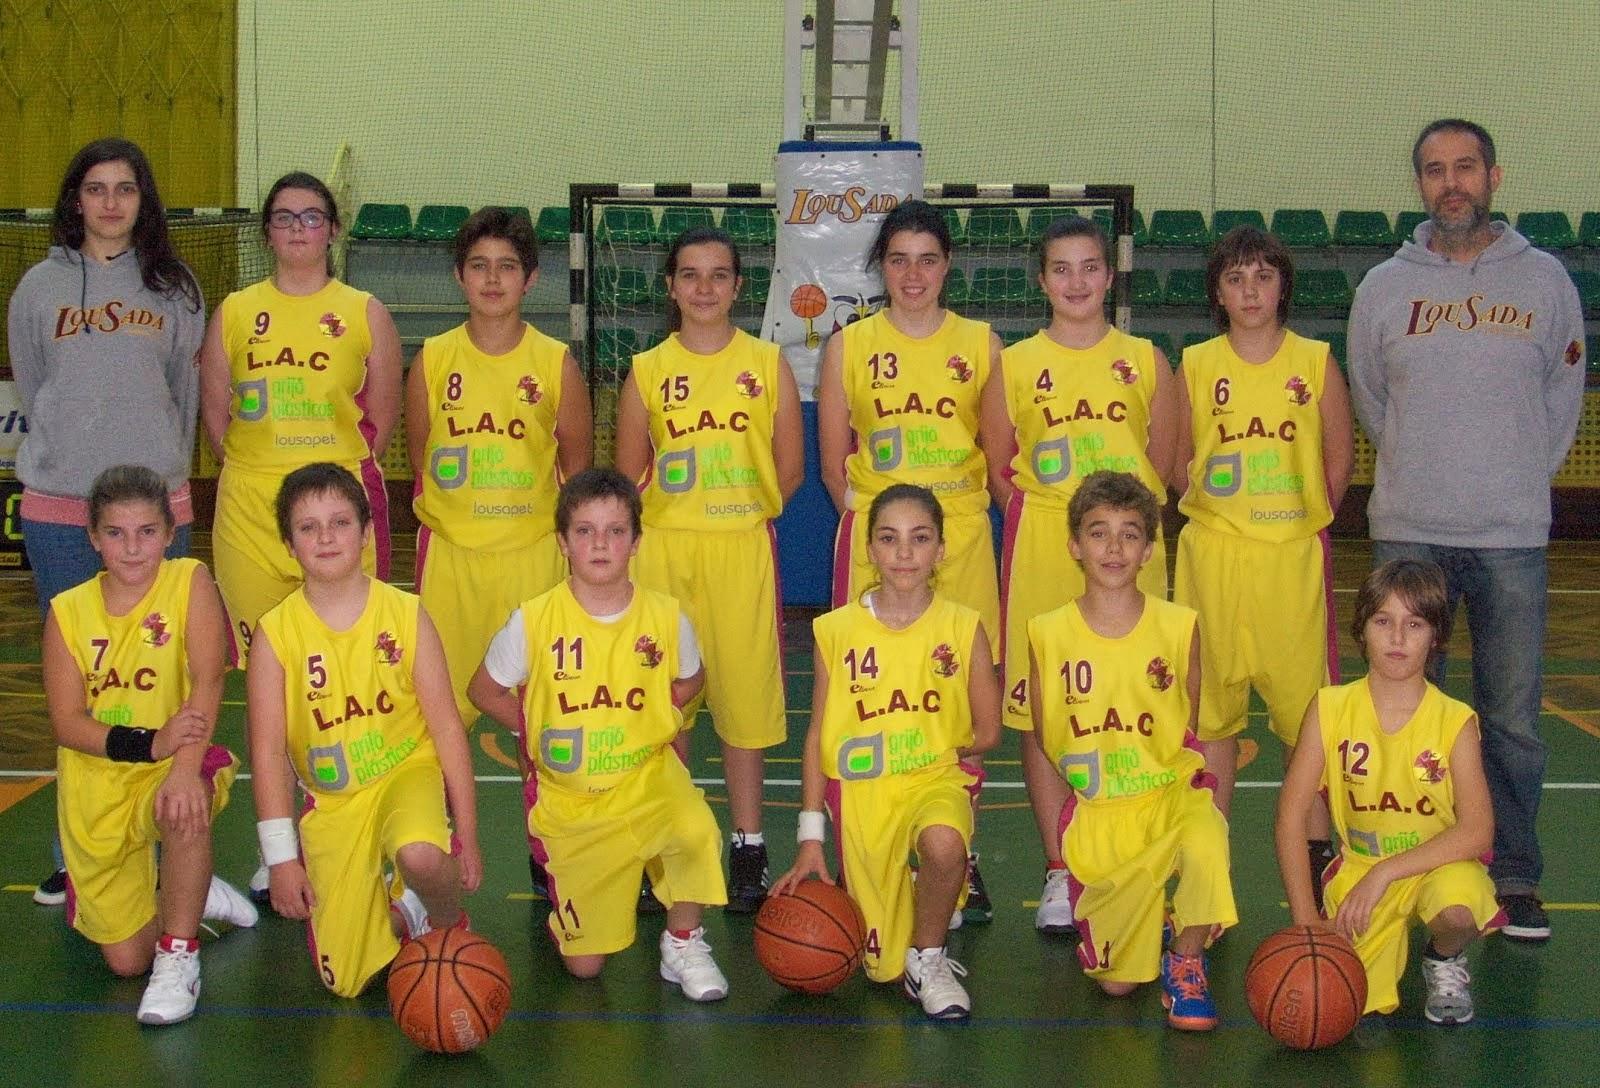 Infantis Mistos 2013-14